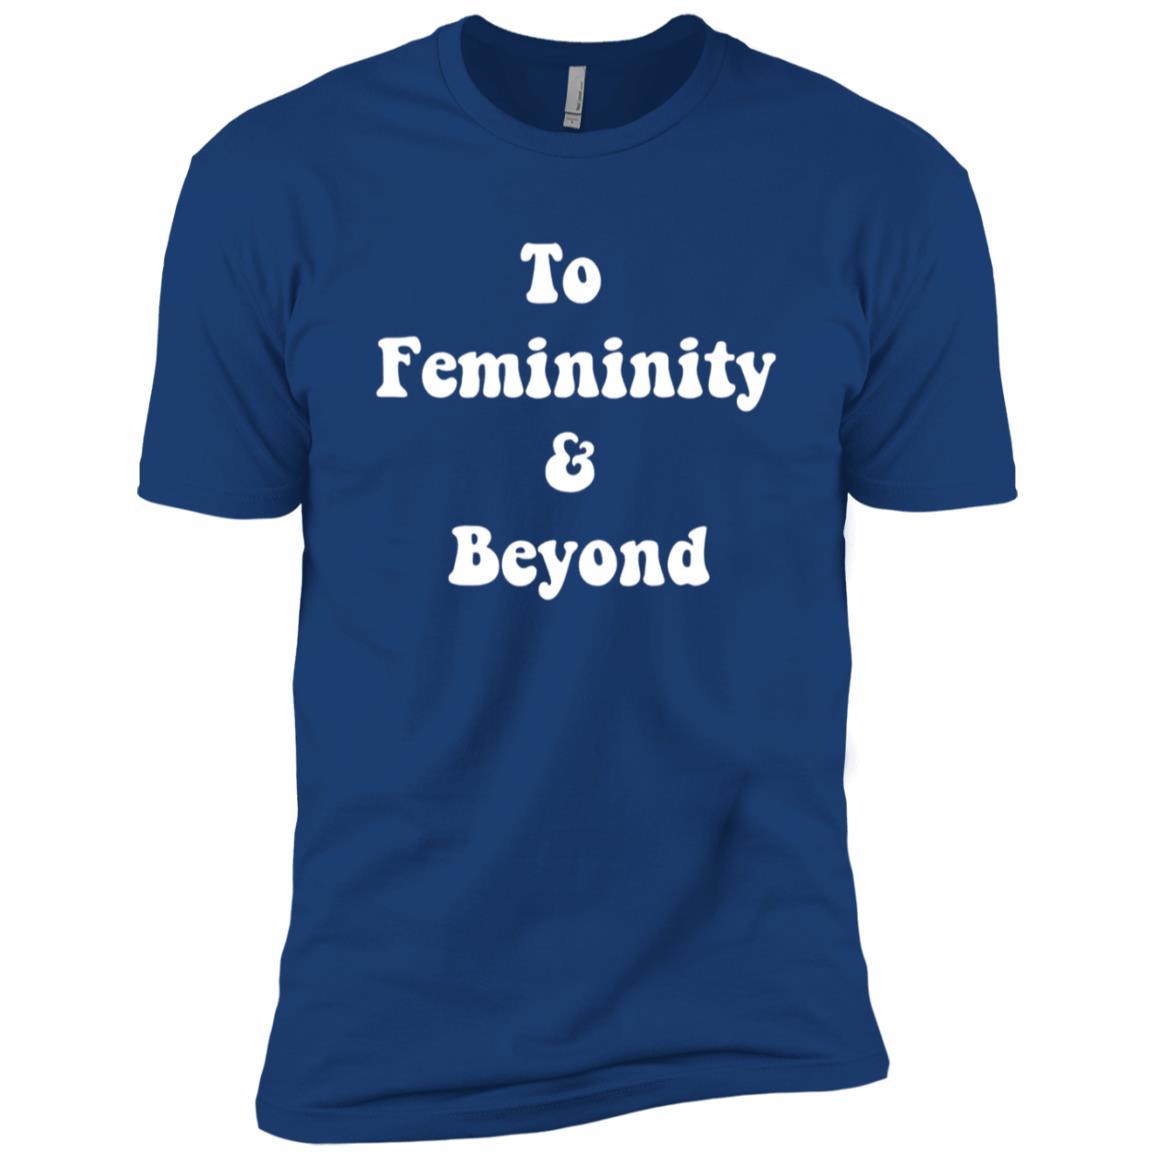 To Femininity & Beyond Feminist Men Short Sleeve T-Shirt